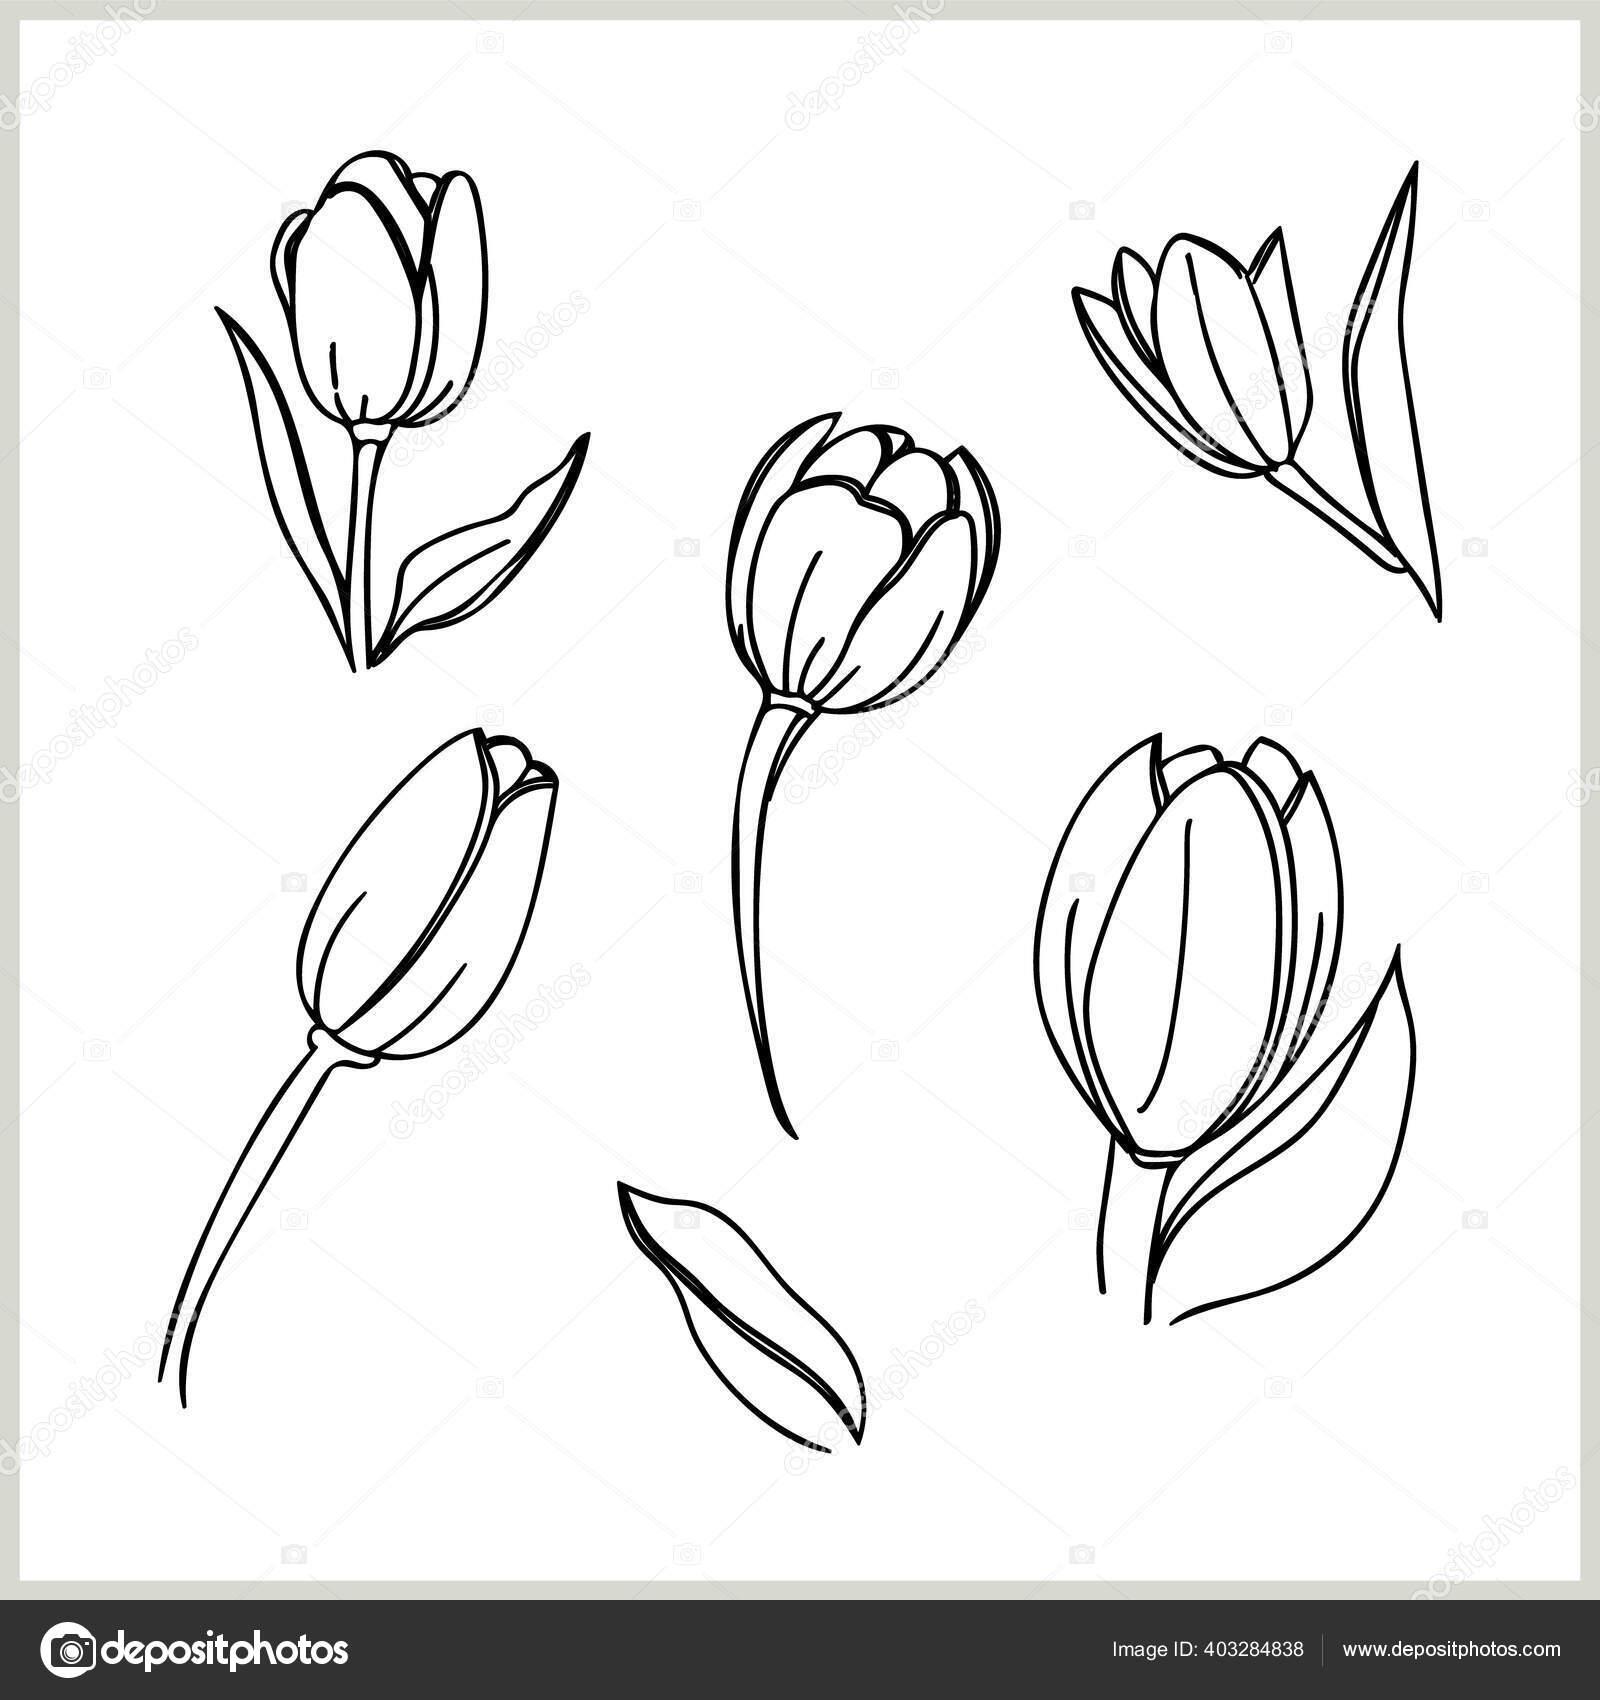 Tulip Grafis Hitam Dan Putih Vektor Stok Vektor C Svemar 403284838